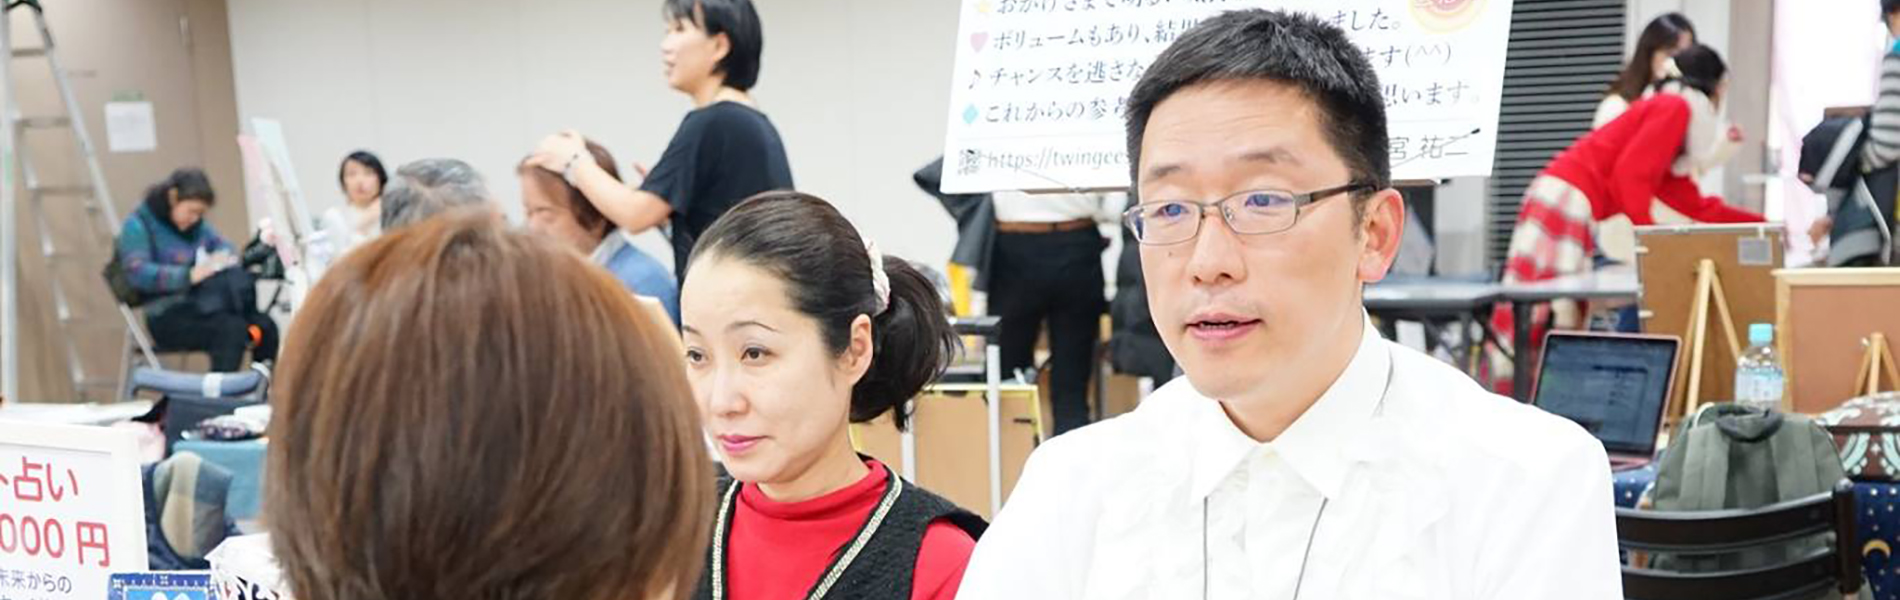 YouTube公開中 2020年7月までの 日本の大運